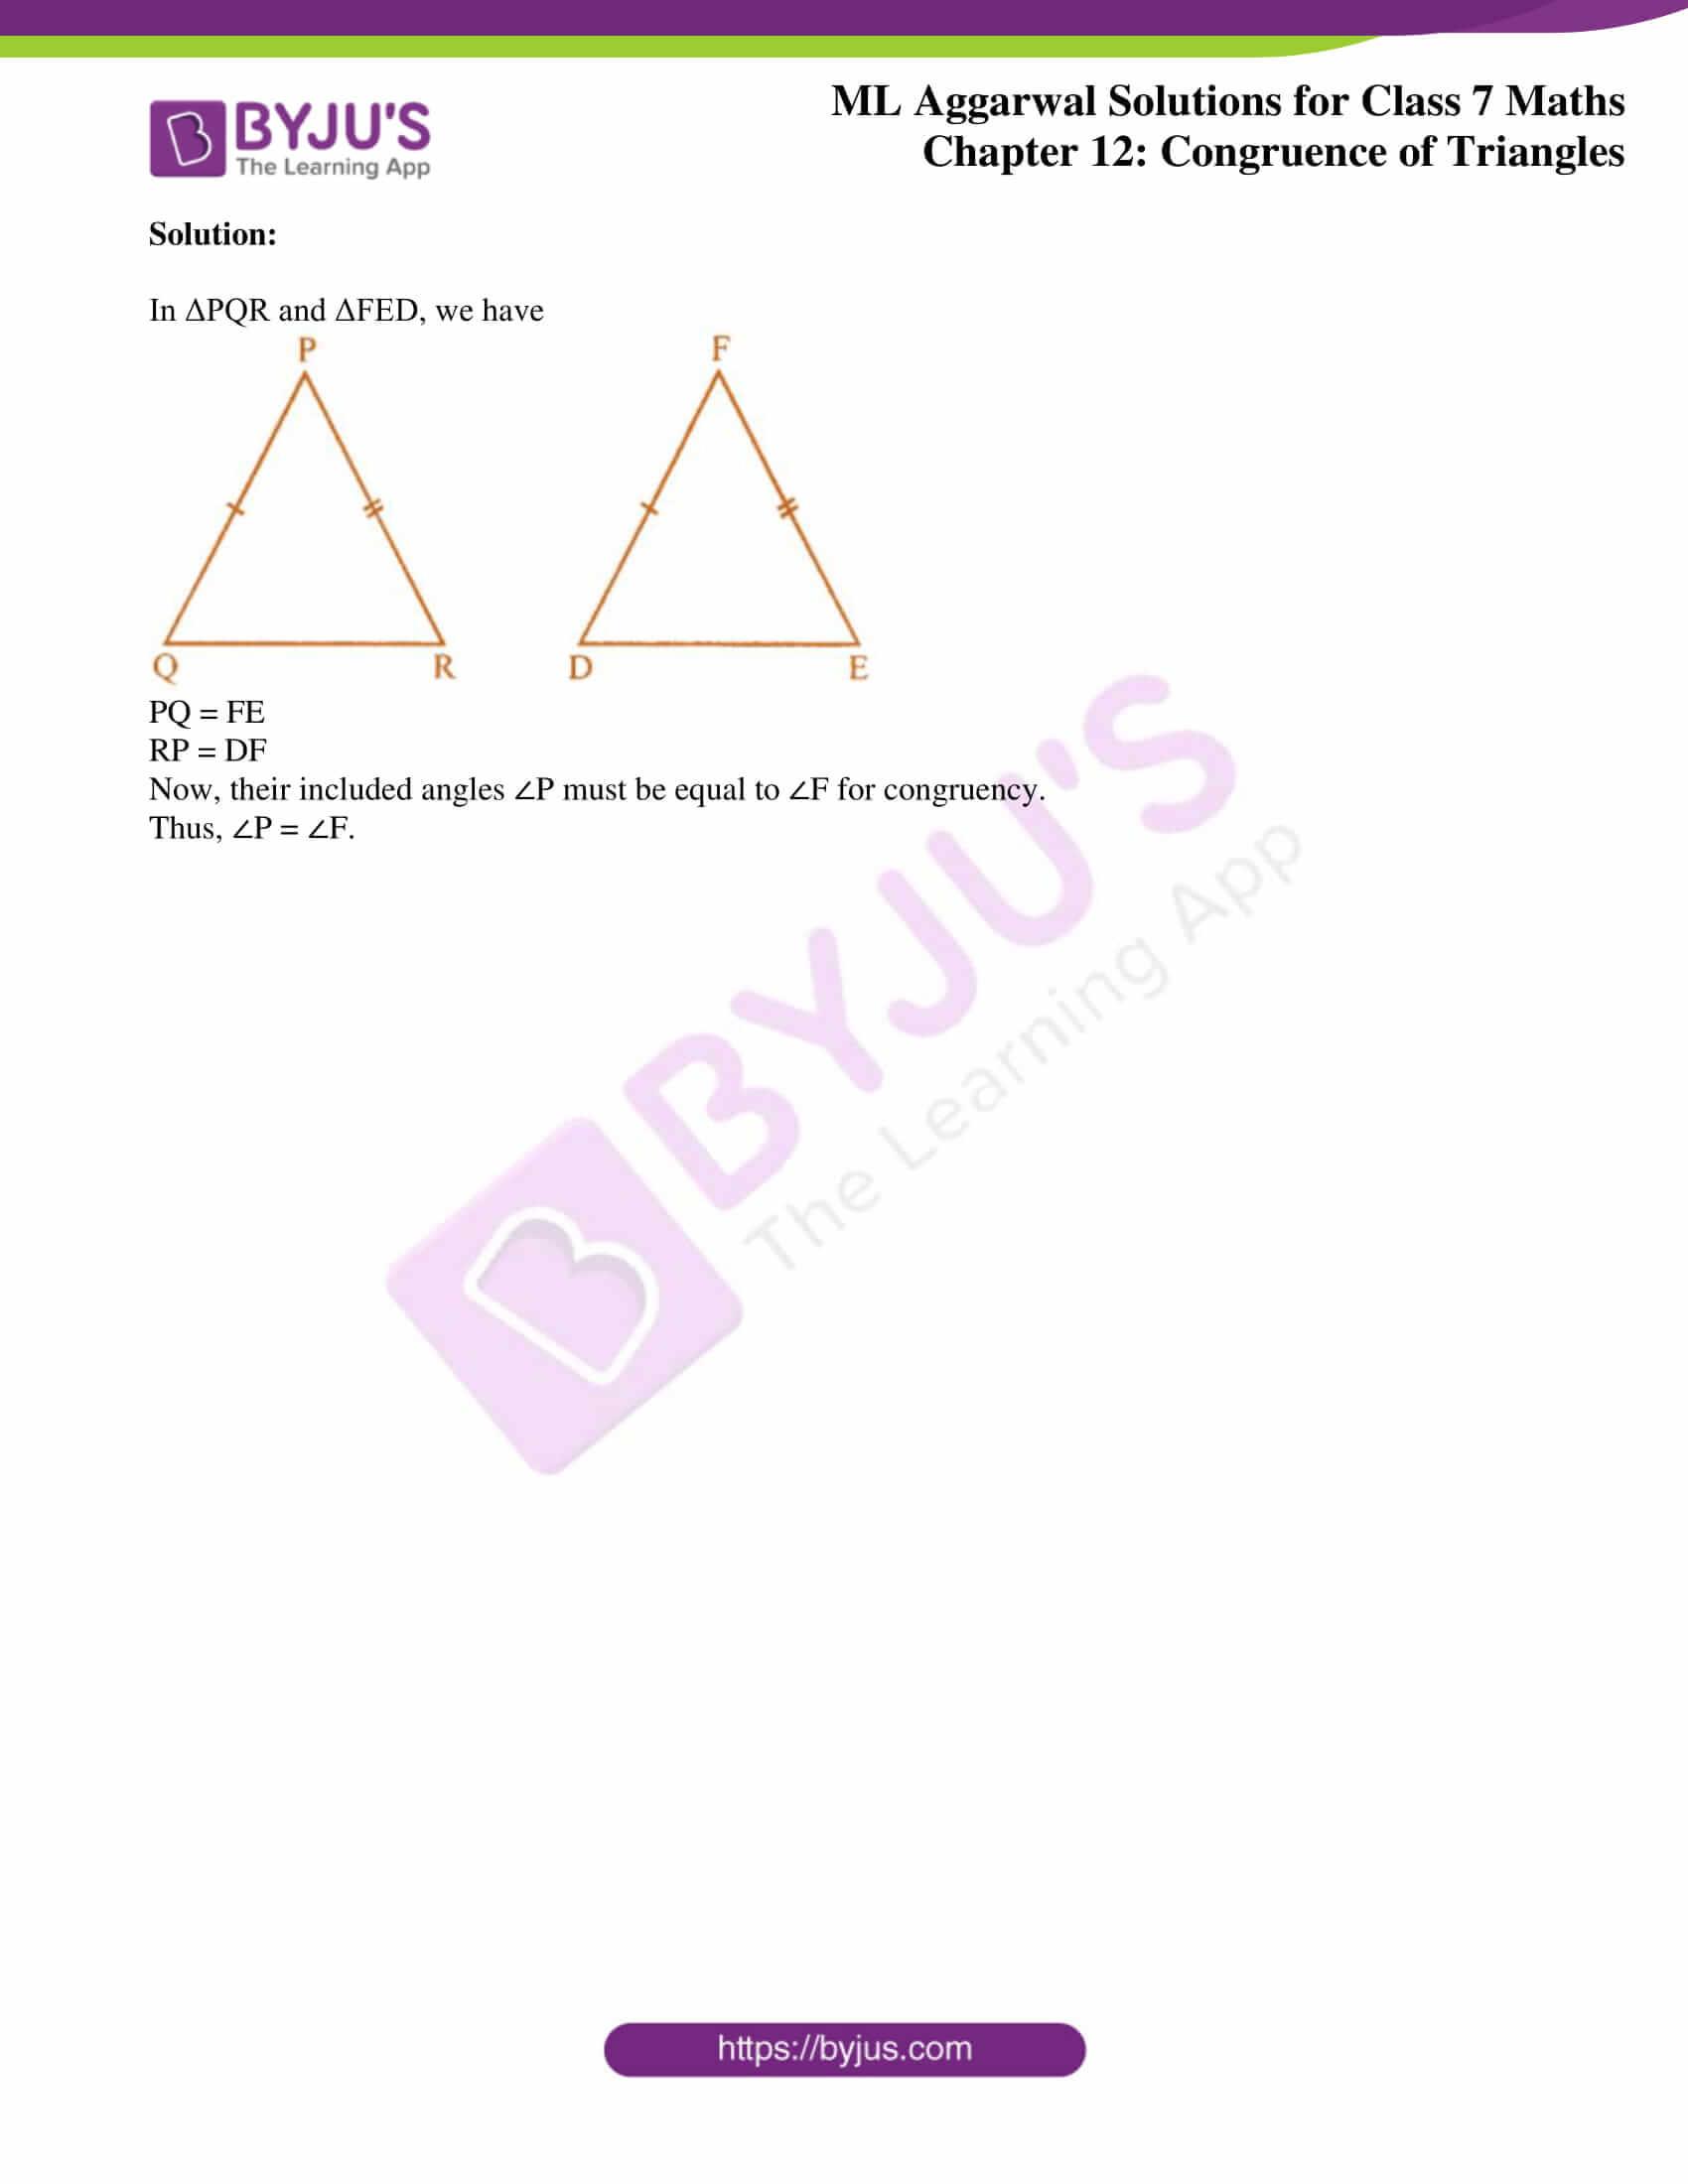 ml aggarwal sol class 7 maths chapter 12 5